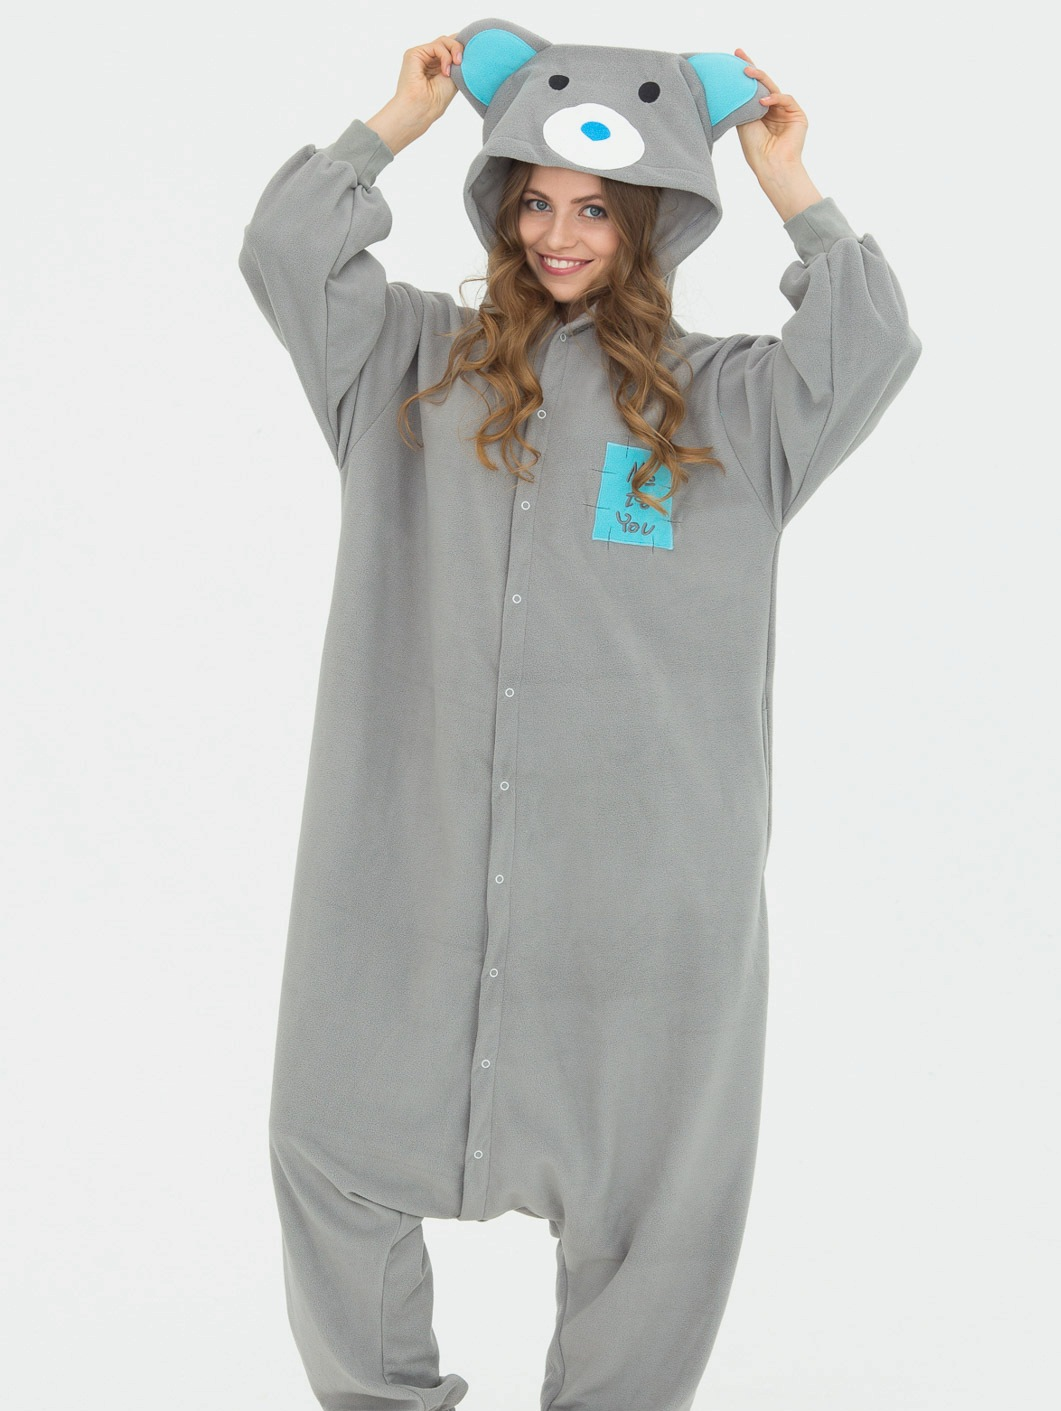 Женская пижама «Панда» (41 фото)  для девушек bd67c21e74dac